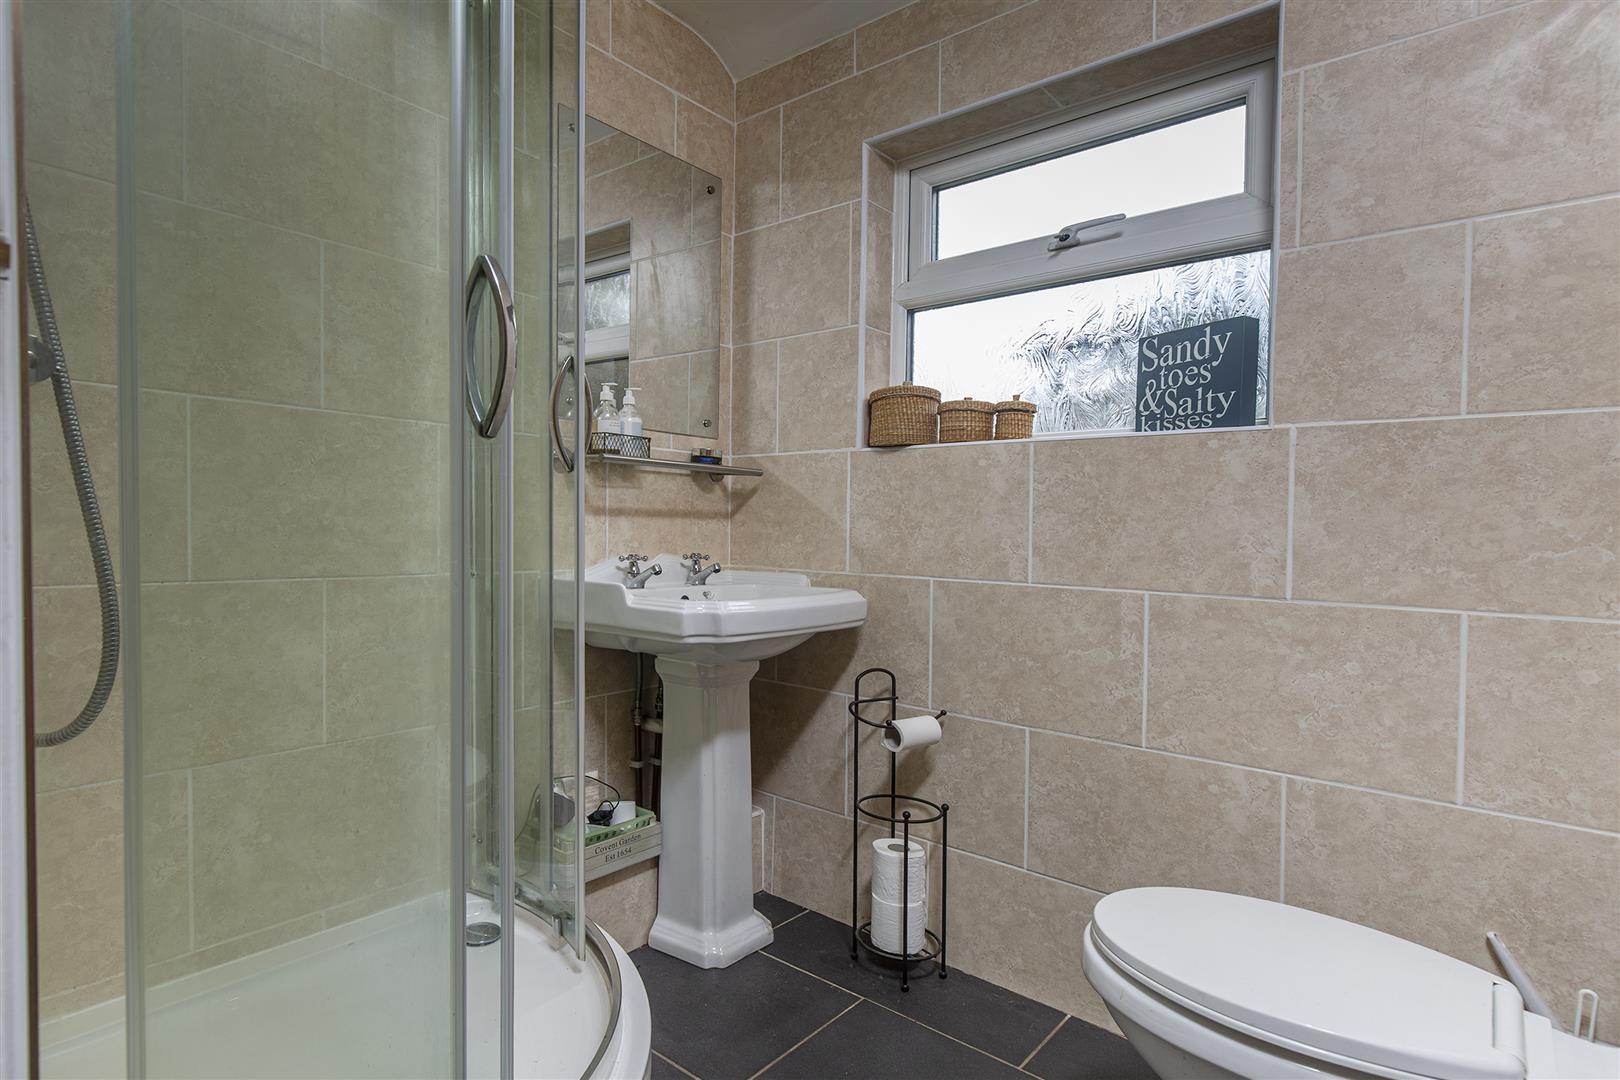 Cloakroom WC/Shower Room